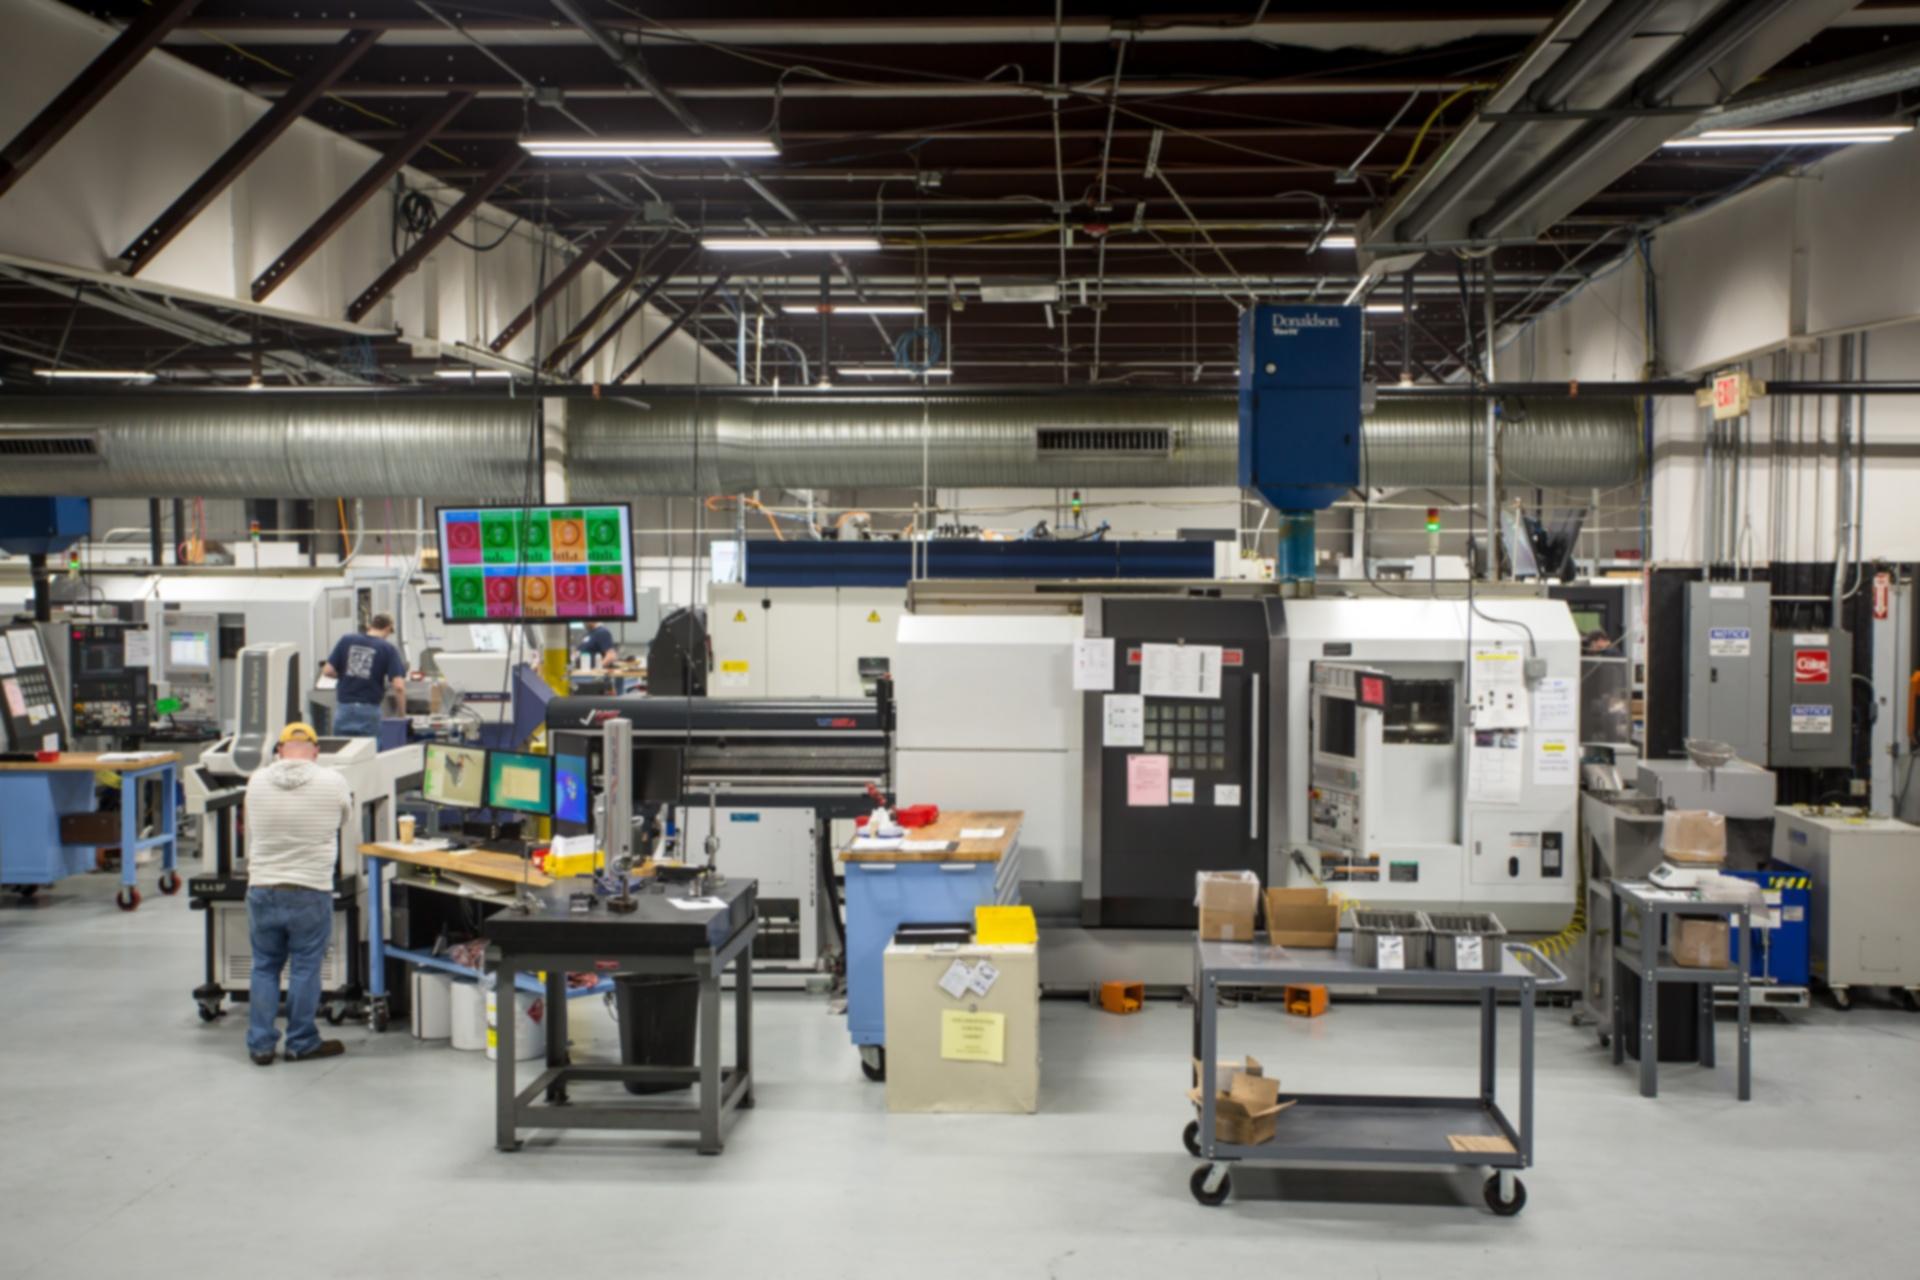 CNC Machine Monitoring Software for OEE & Lean Manufacturing   MachineMetrics